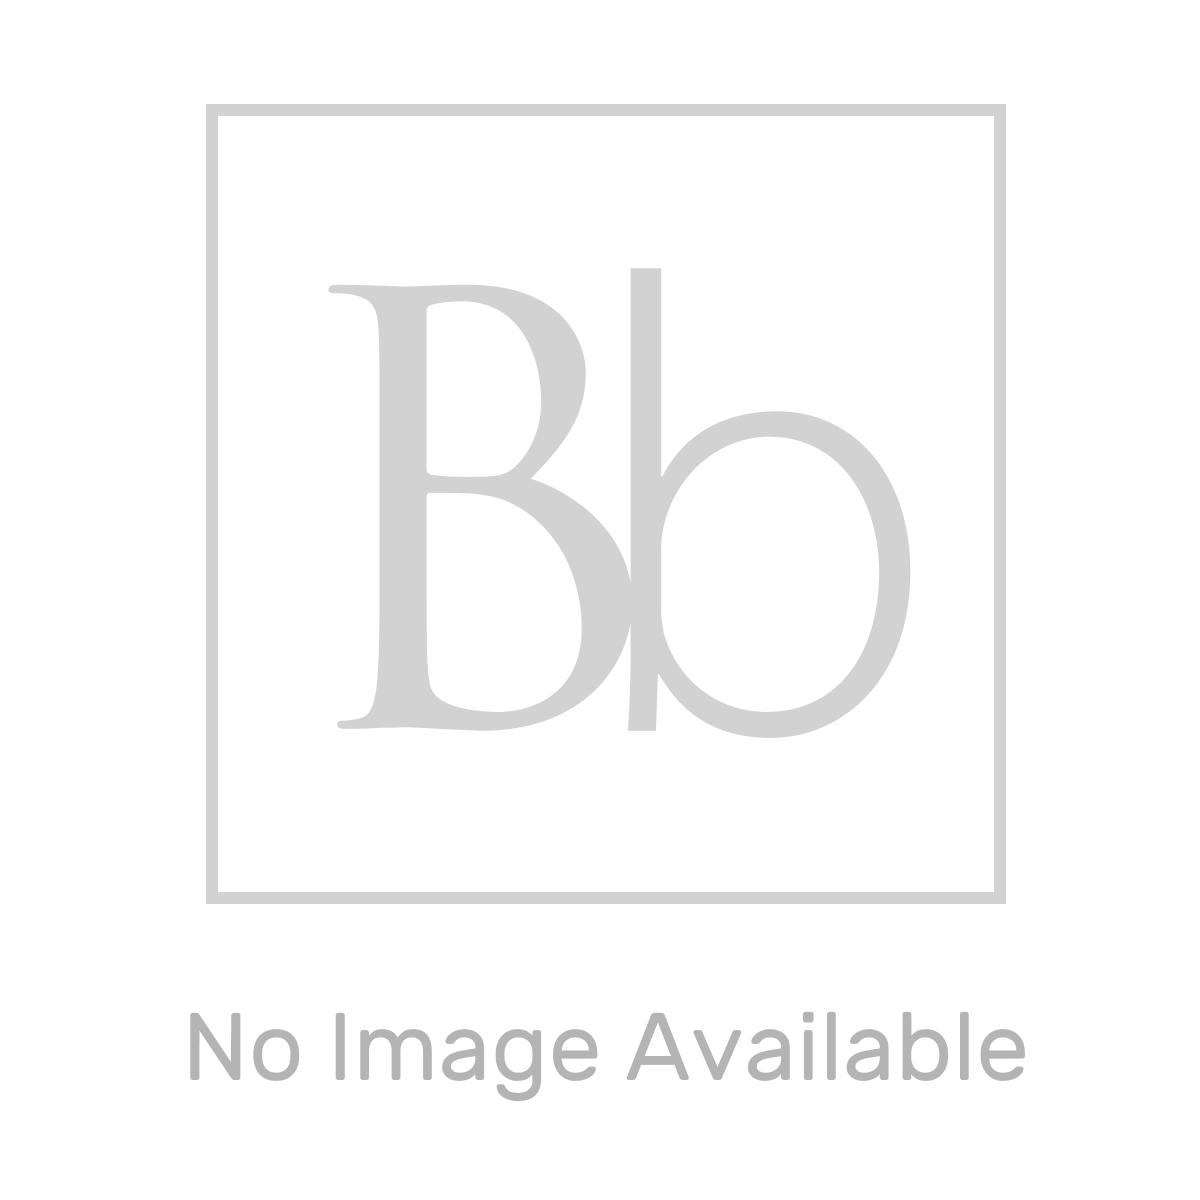 RAK Washington Cappucino Freestanding Bath 1560mm